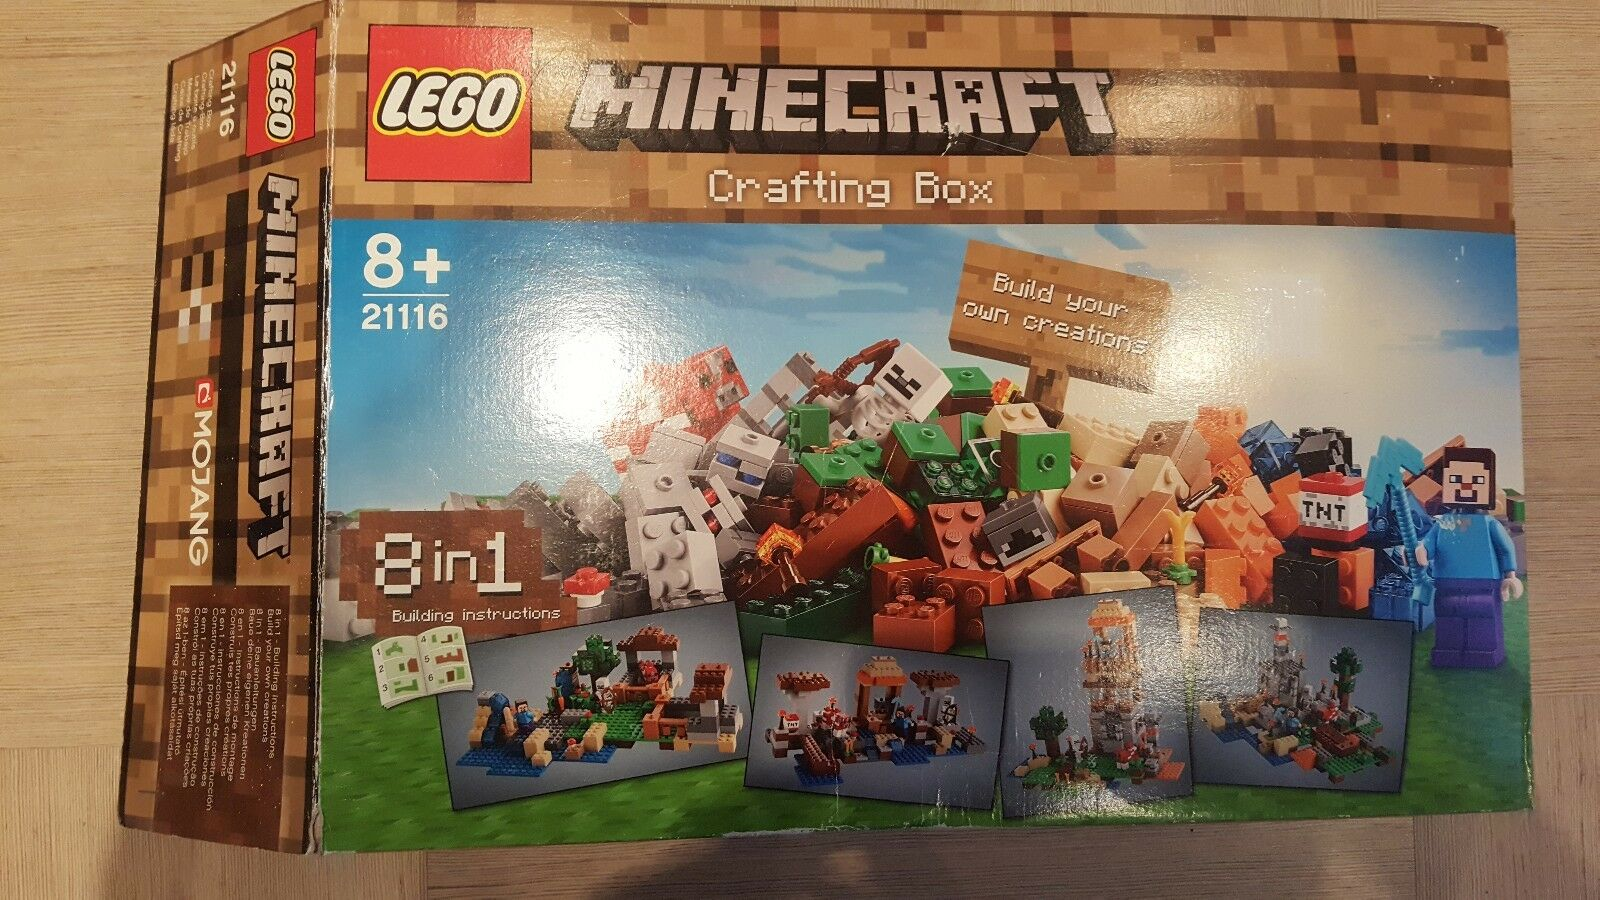 LEGO 21116 Minecraft artigianale BOX